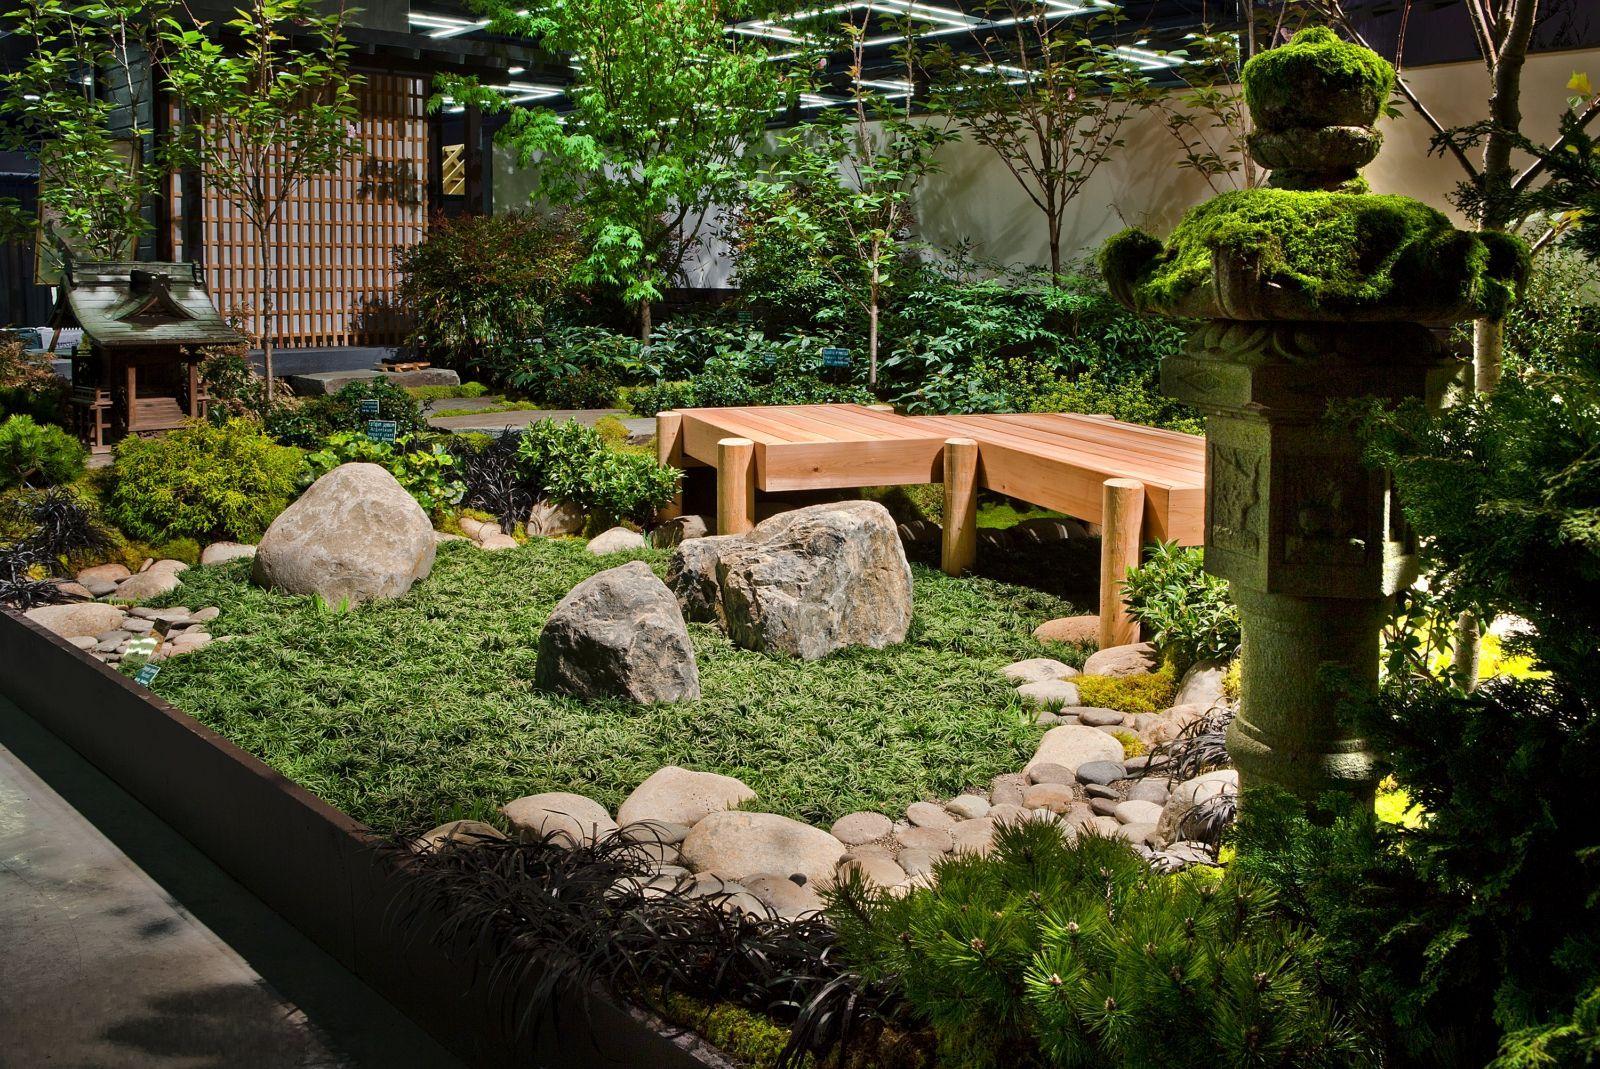 japanese indoor garden Google Search Personal interest